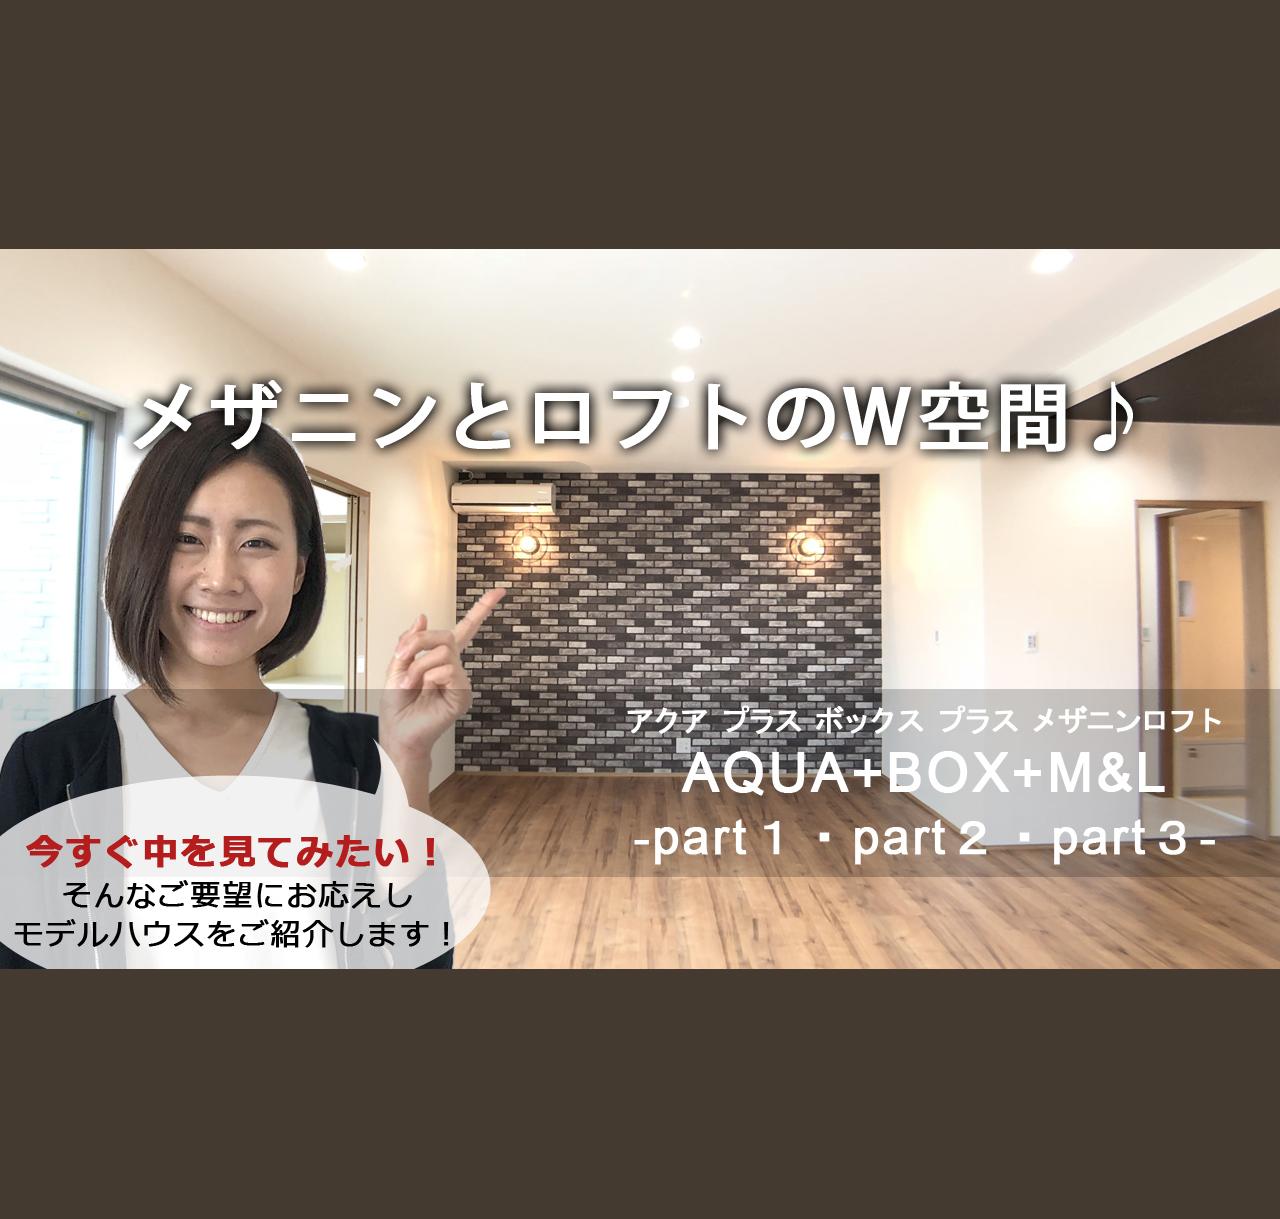 Youtube限定!WEB見学会 AQUA+BOX+M&L